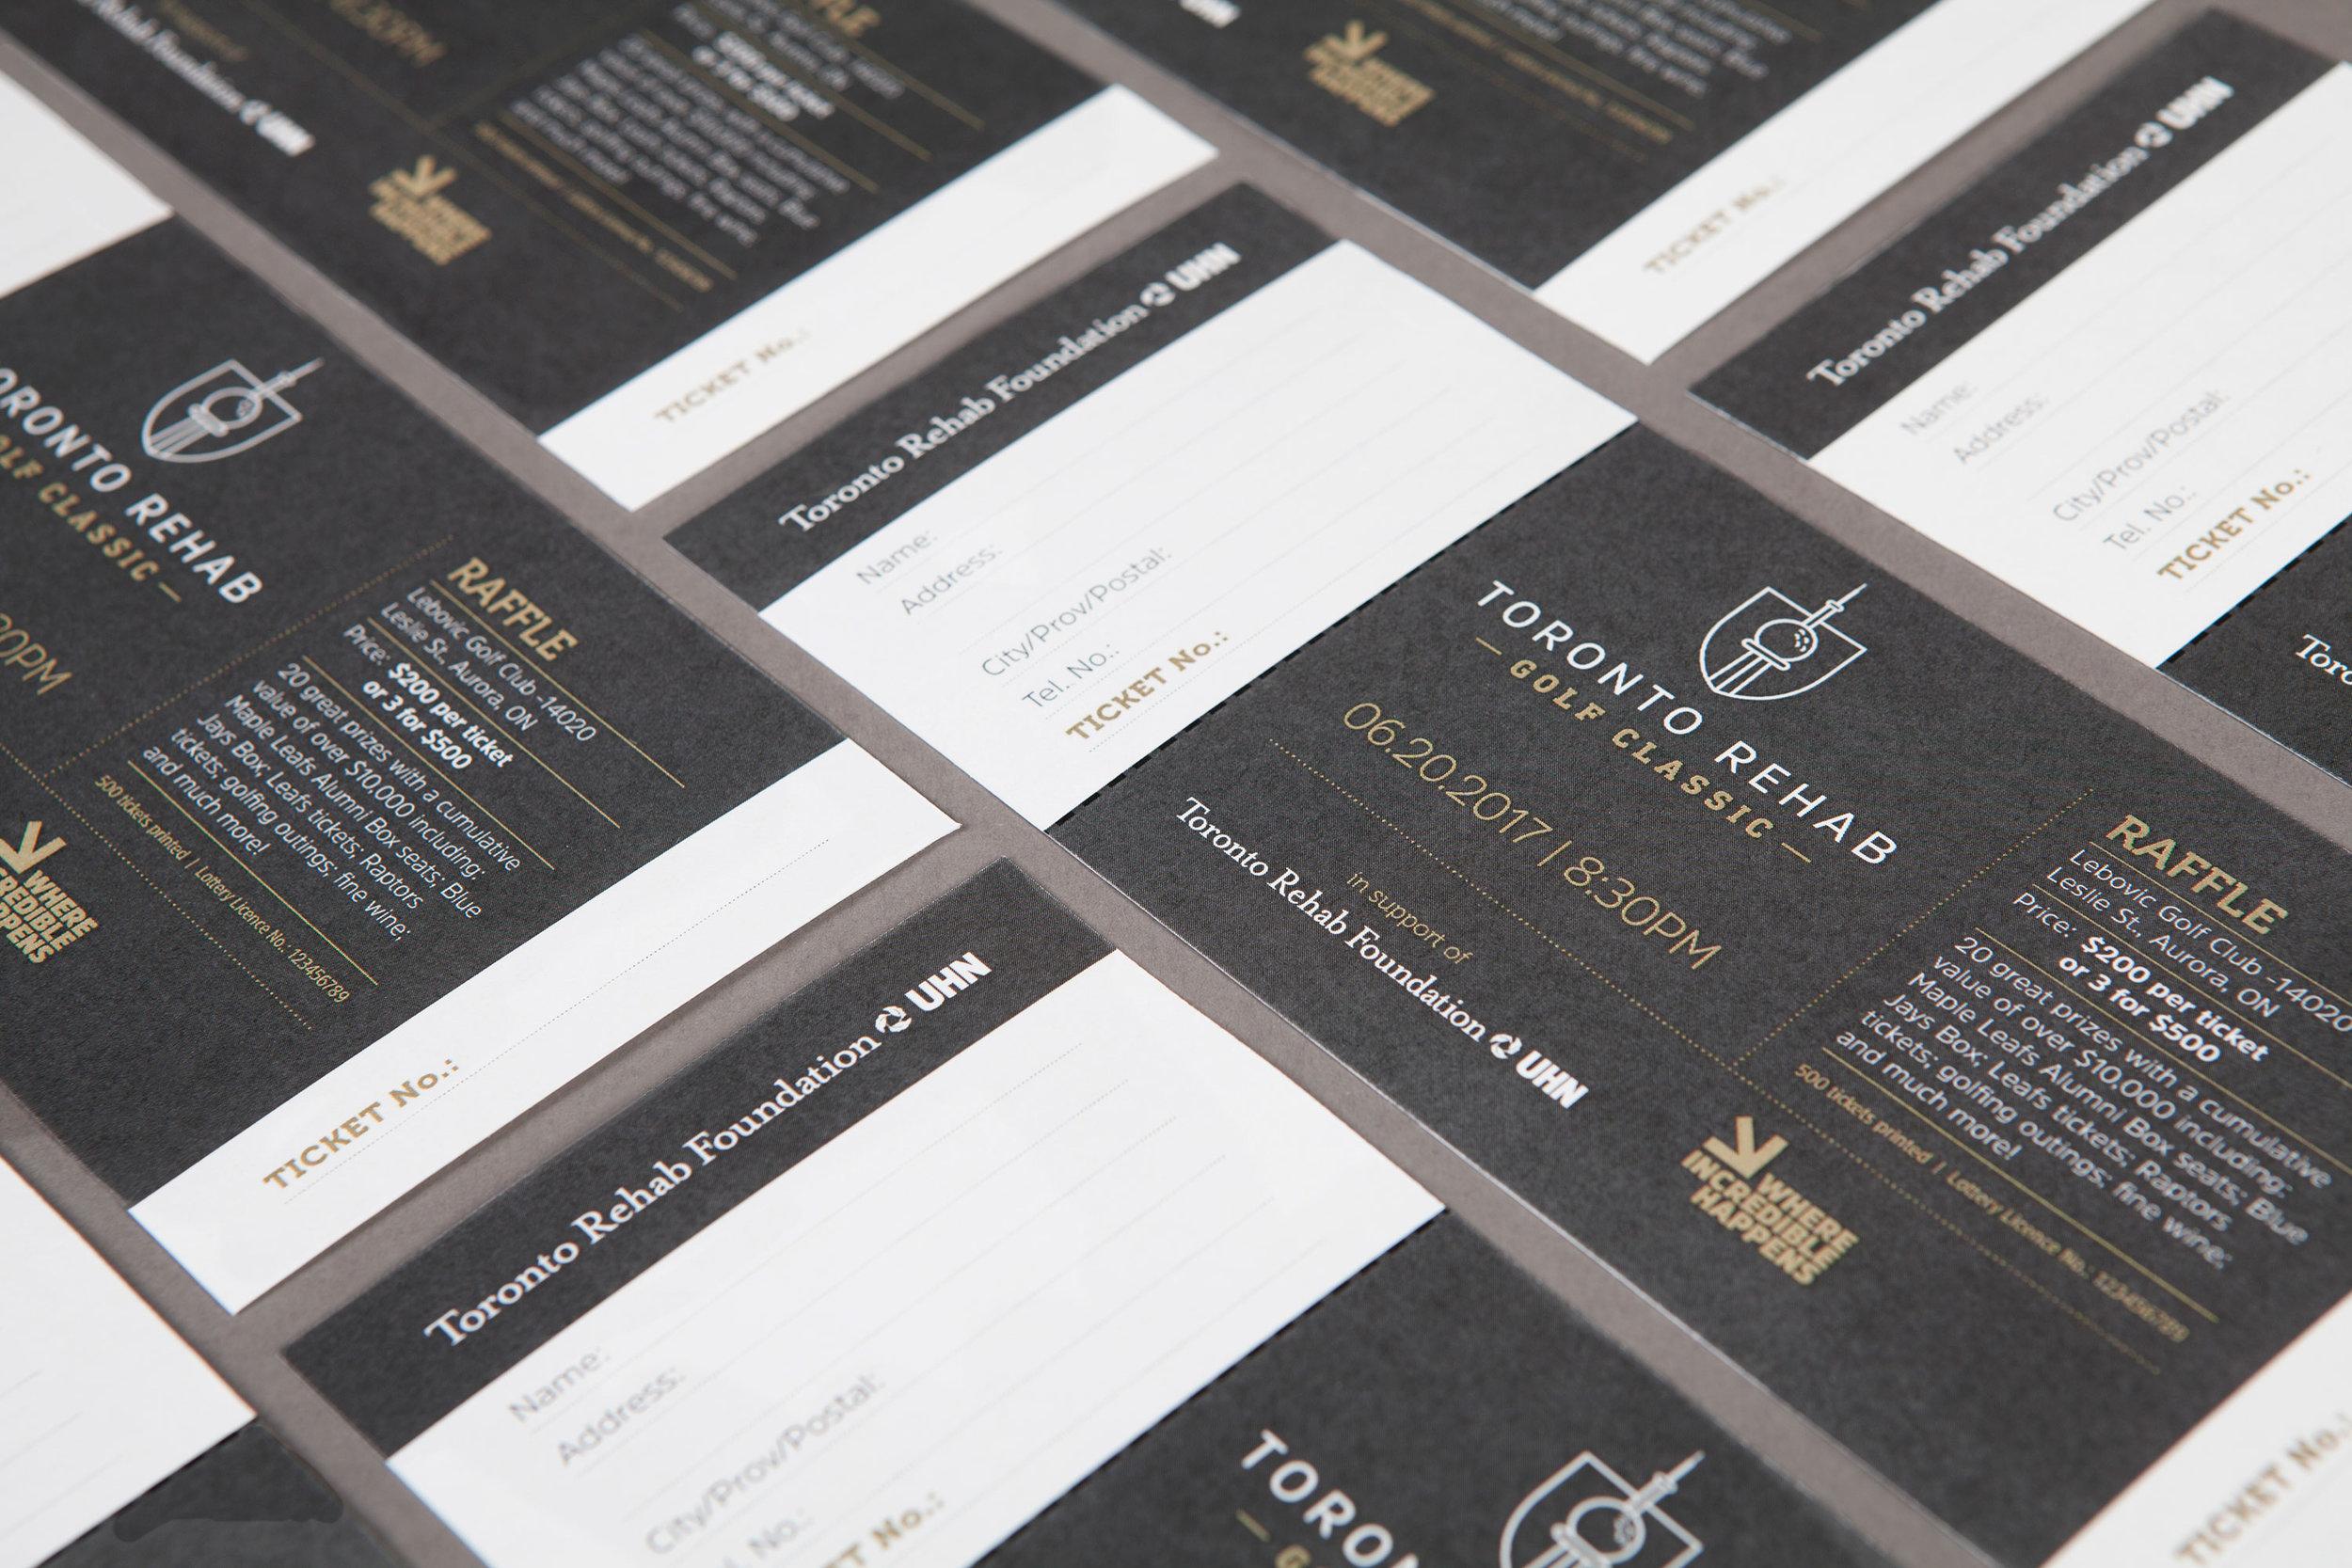 toronto-rehab-foundation-annual-golf-classic-tickets-sputnik-design-partners.jpg